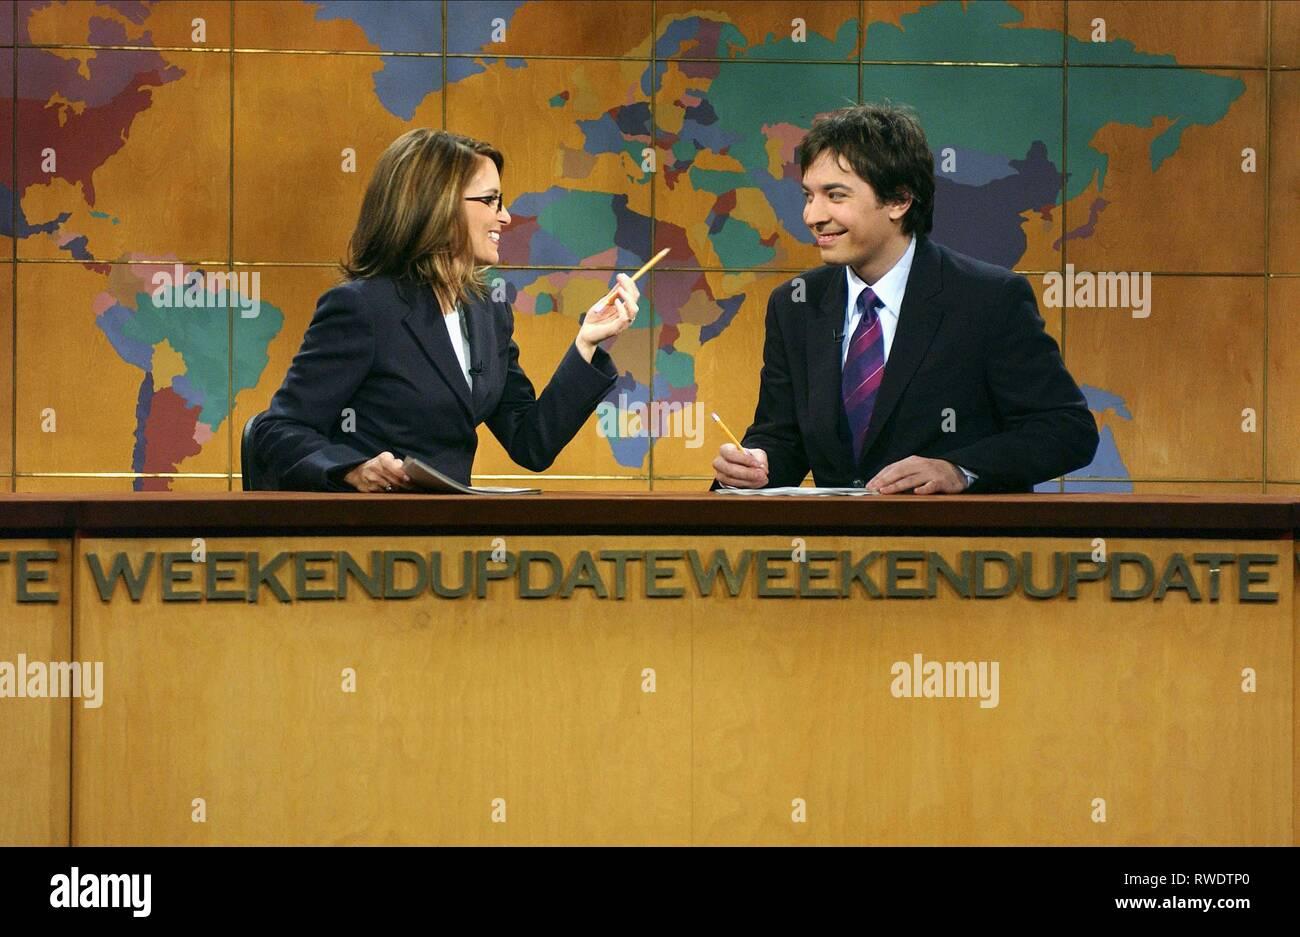 FEY,FALLON, SATURDAY NIGHT LIVE, 2003 - Stock Image